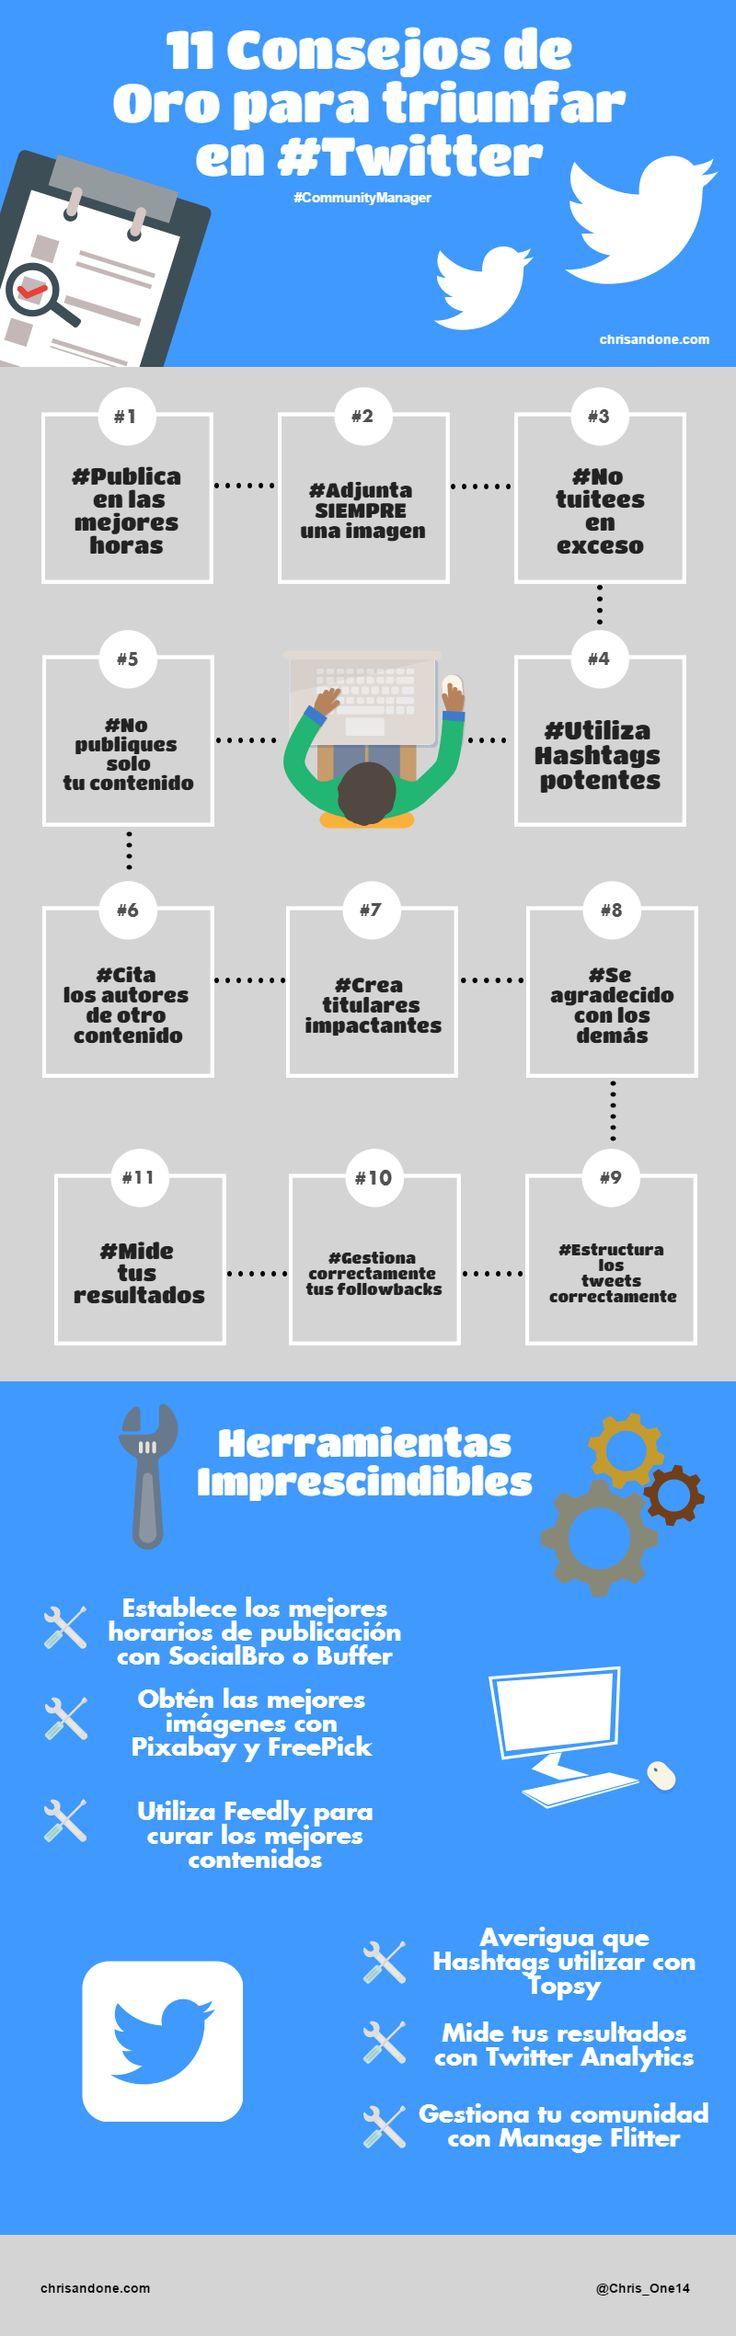 11 Consejos de Oro para triunfar en Twitter #infografia #infographic #Twitter